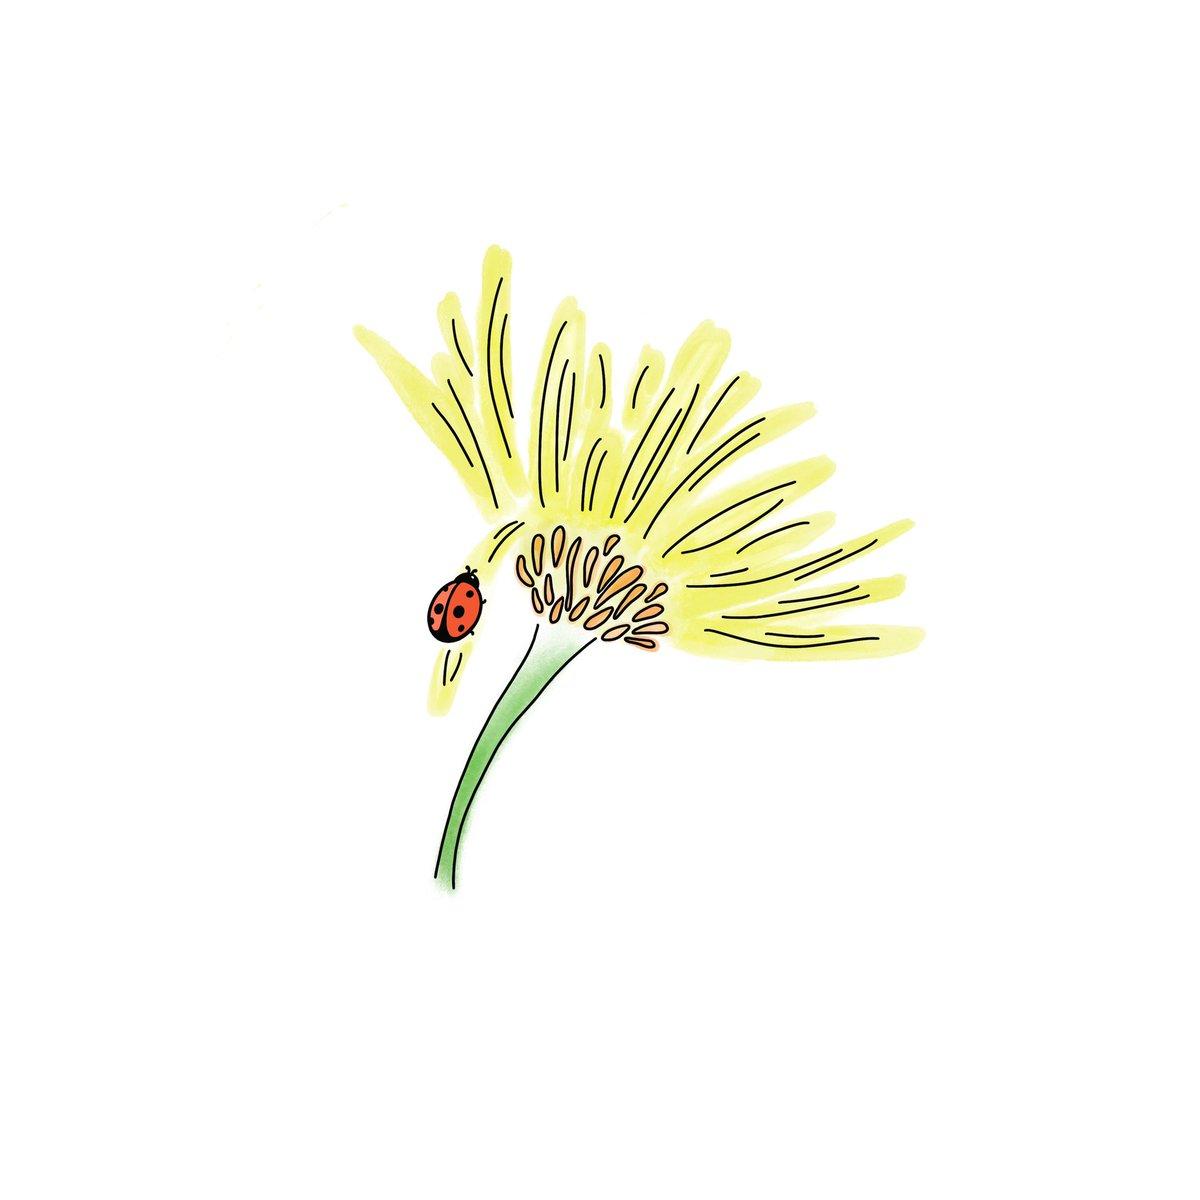 #drawindifferentstyles N.3. Water and ink improvisation. #procreatewatercolor  #drawindifferentstyles #daisydrawing #digitaldaisy #illustrate #illustration #illustrationoftheday #artchallenge #drawwithinyourstyle #drawchallenge #digitalartwork #procreateillustrationpic.twitter.com/neWbz9AU8f